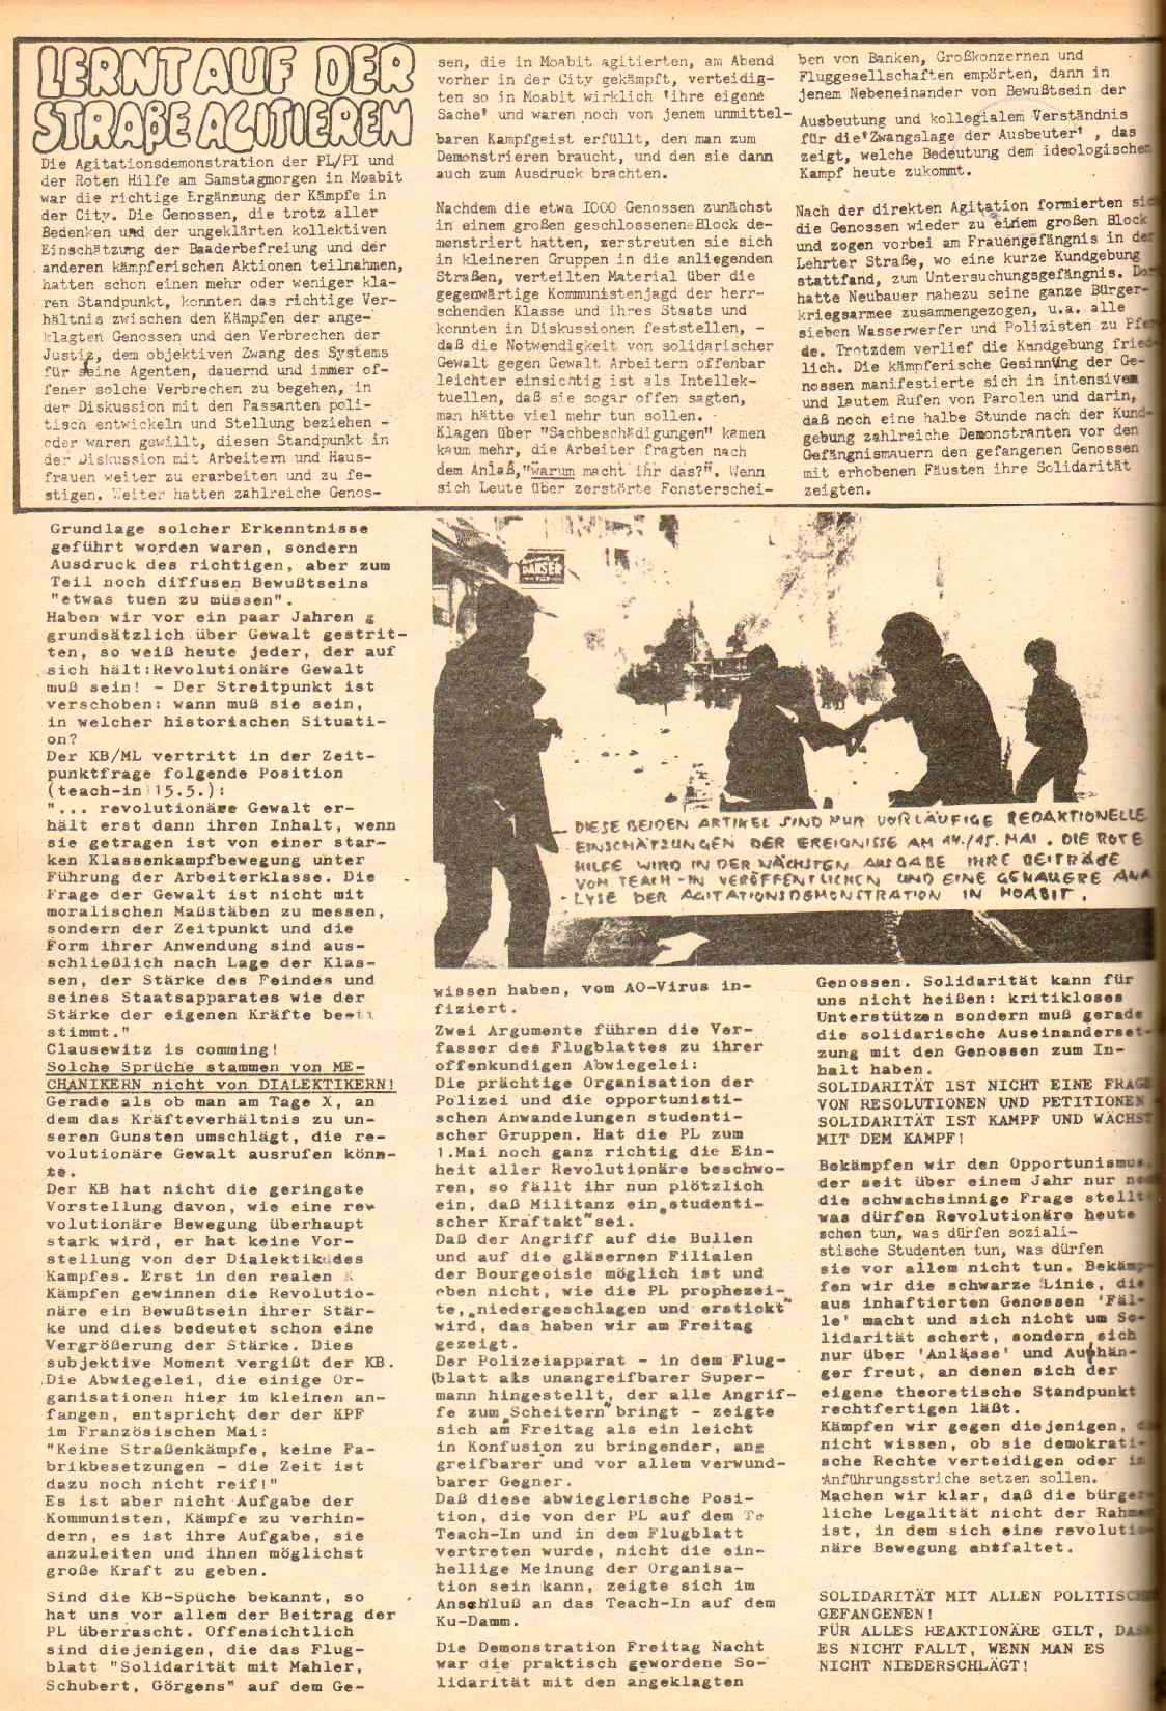 Berlin_Hochschulkampf_1971_09_02